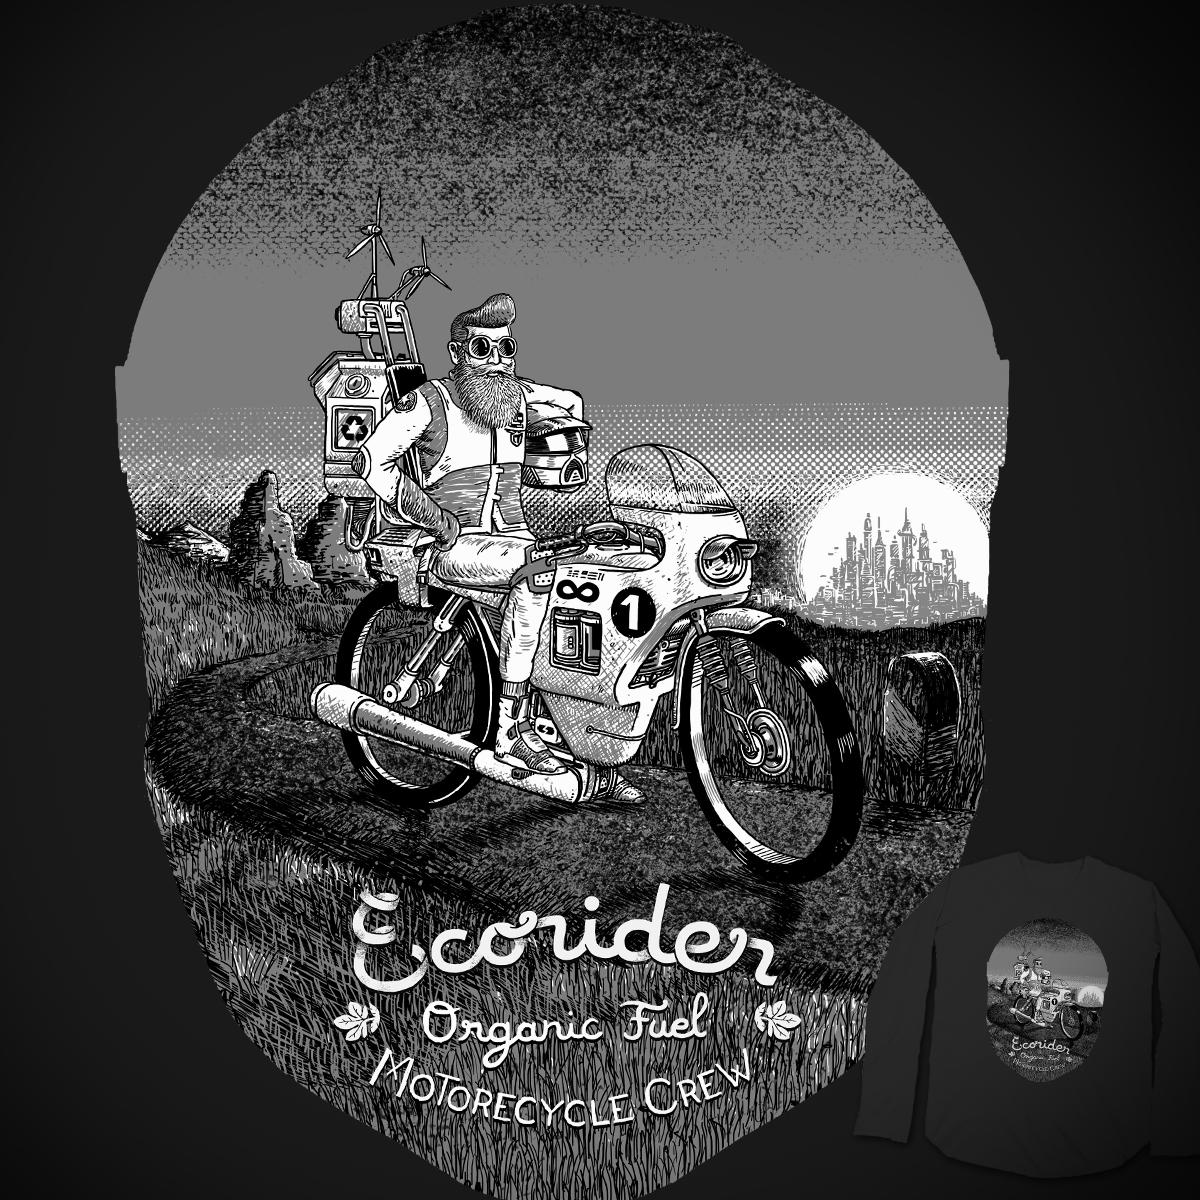 Ecorider by c-royal on Threadless